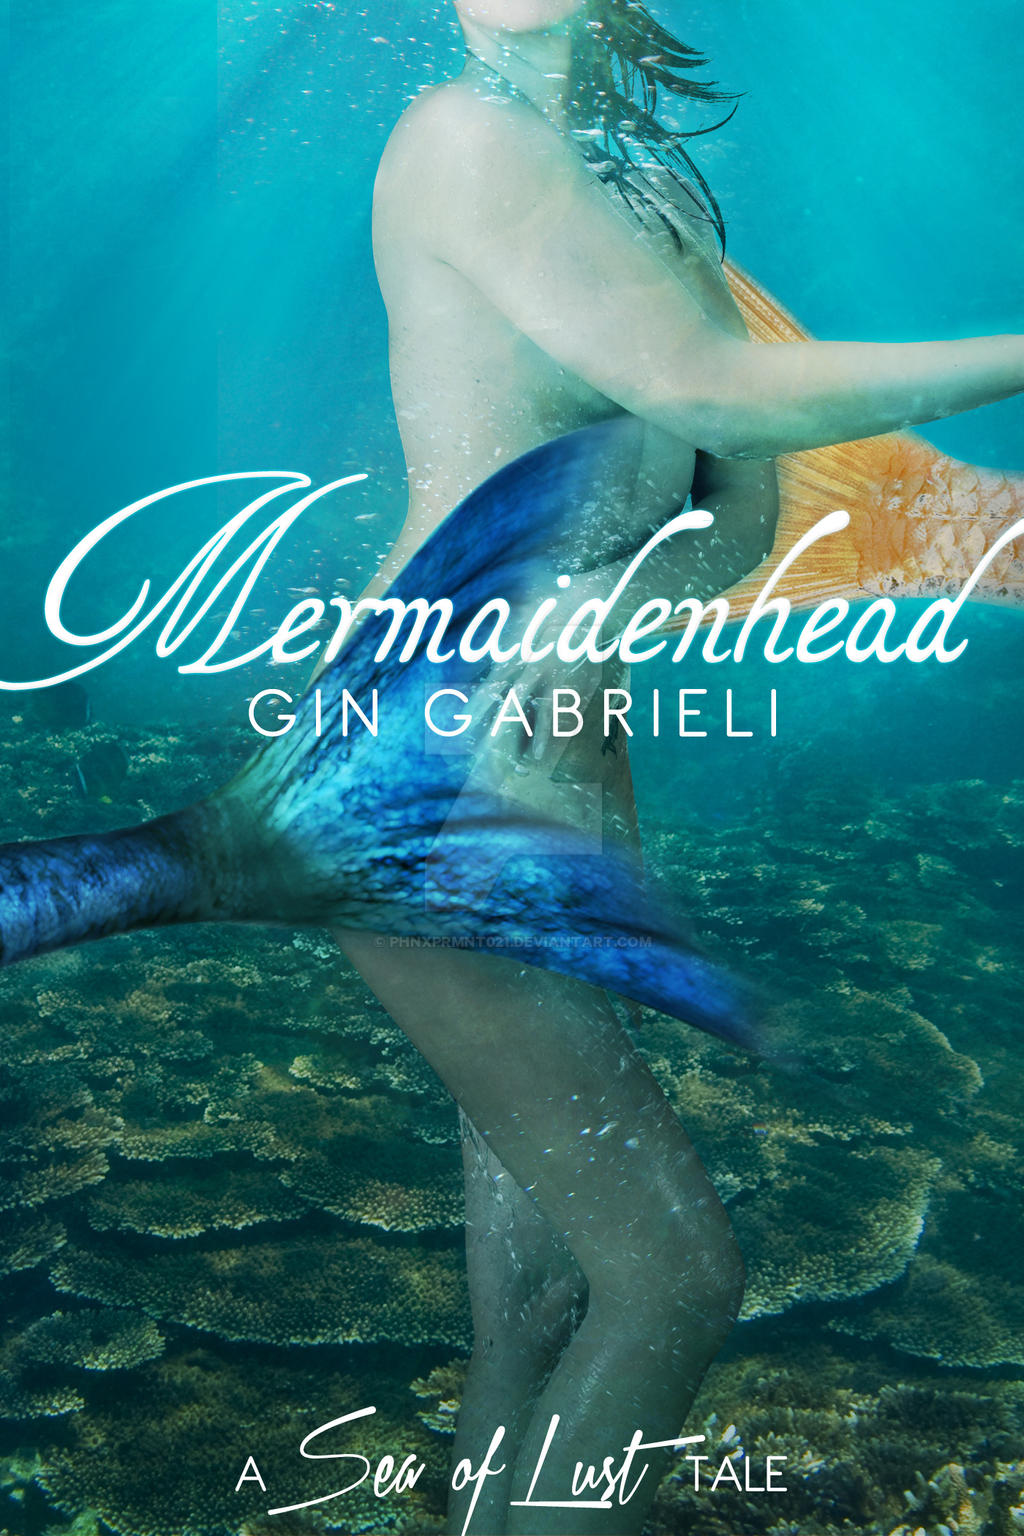 Mermaidenhead by phnxprmnt021